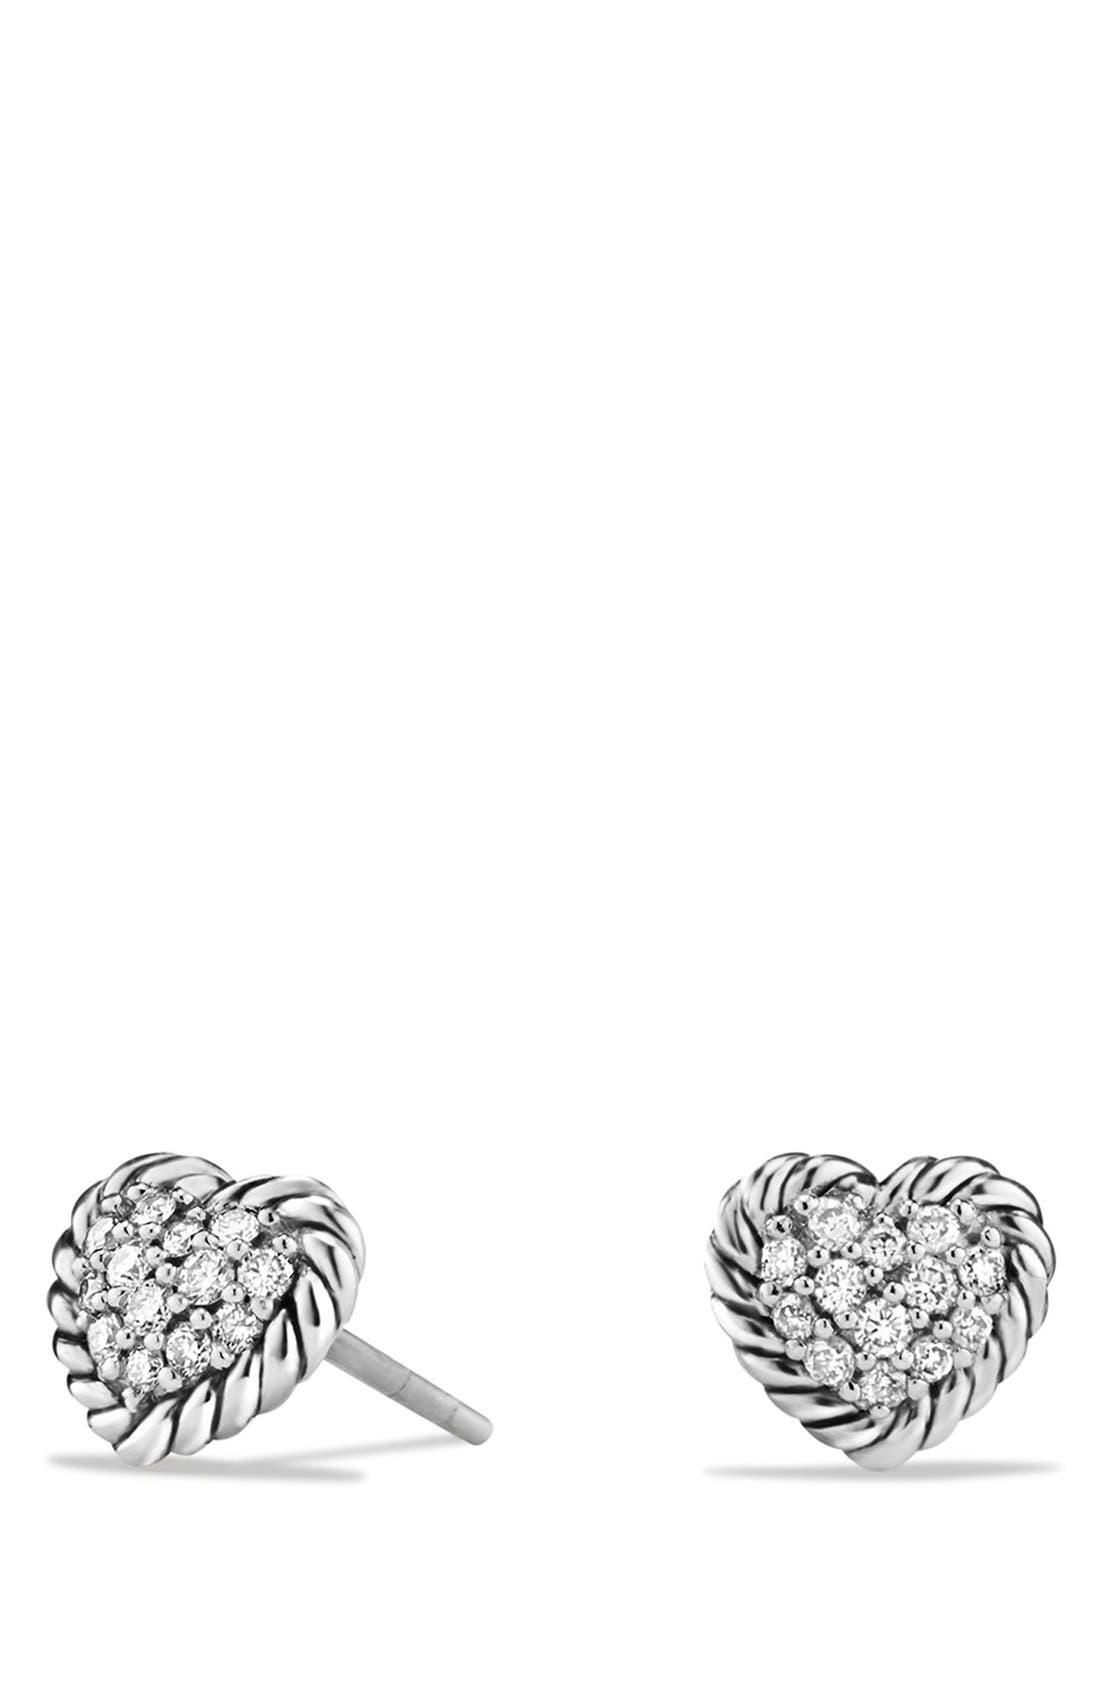 Main Image - David Yurman 'Châtelaine' Heart Earrings with Diamonds